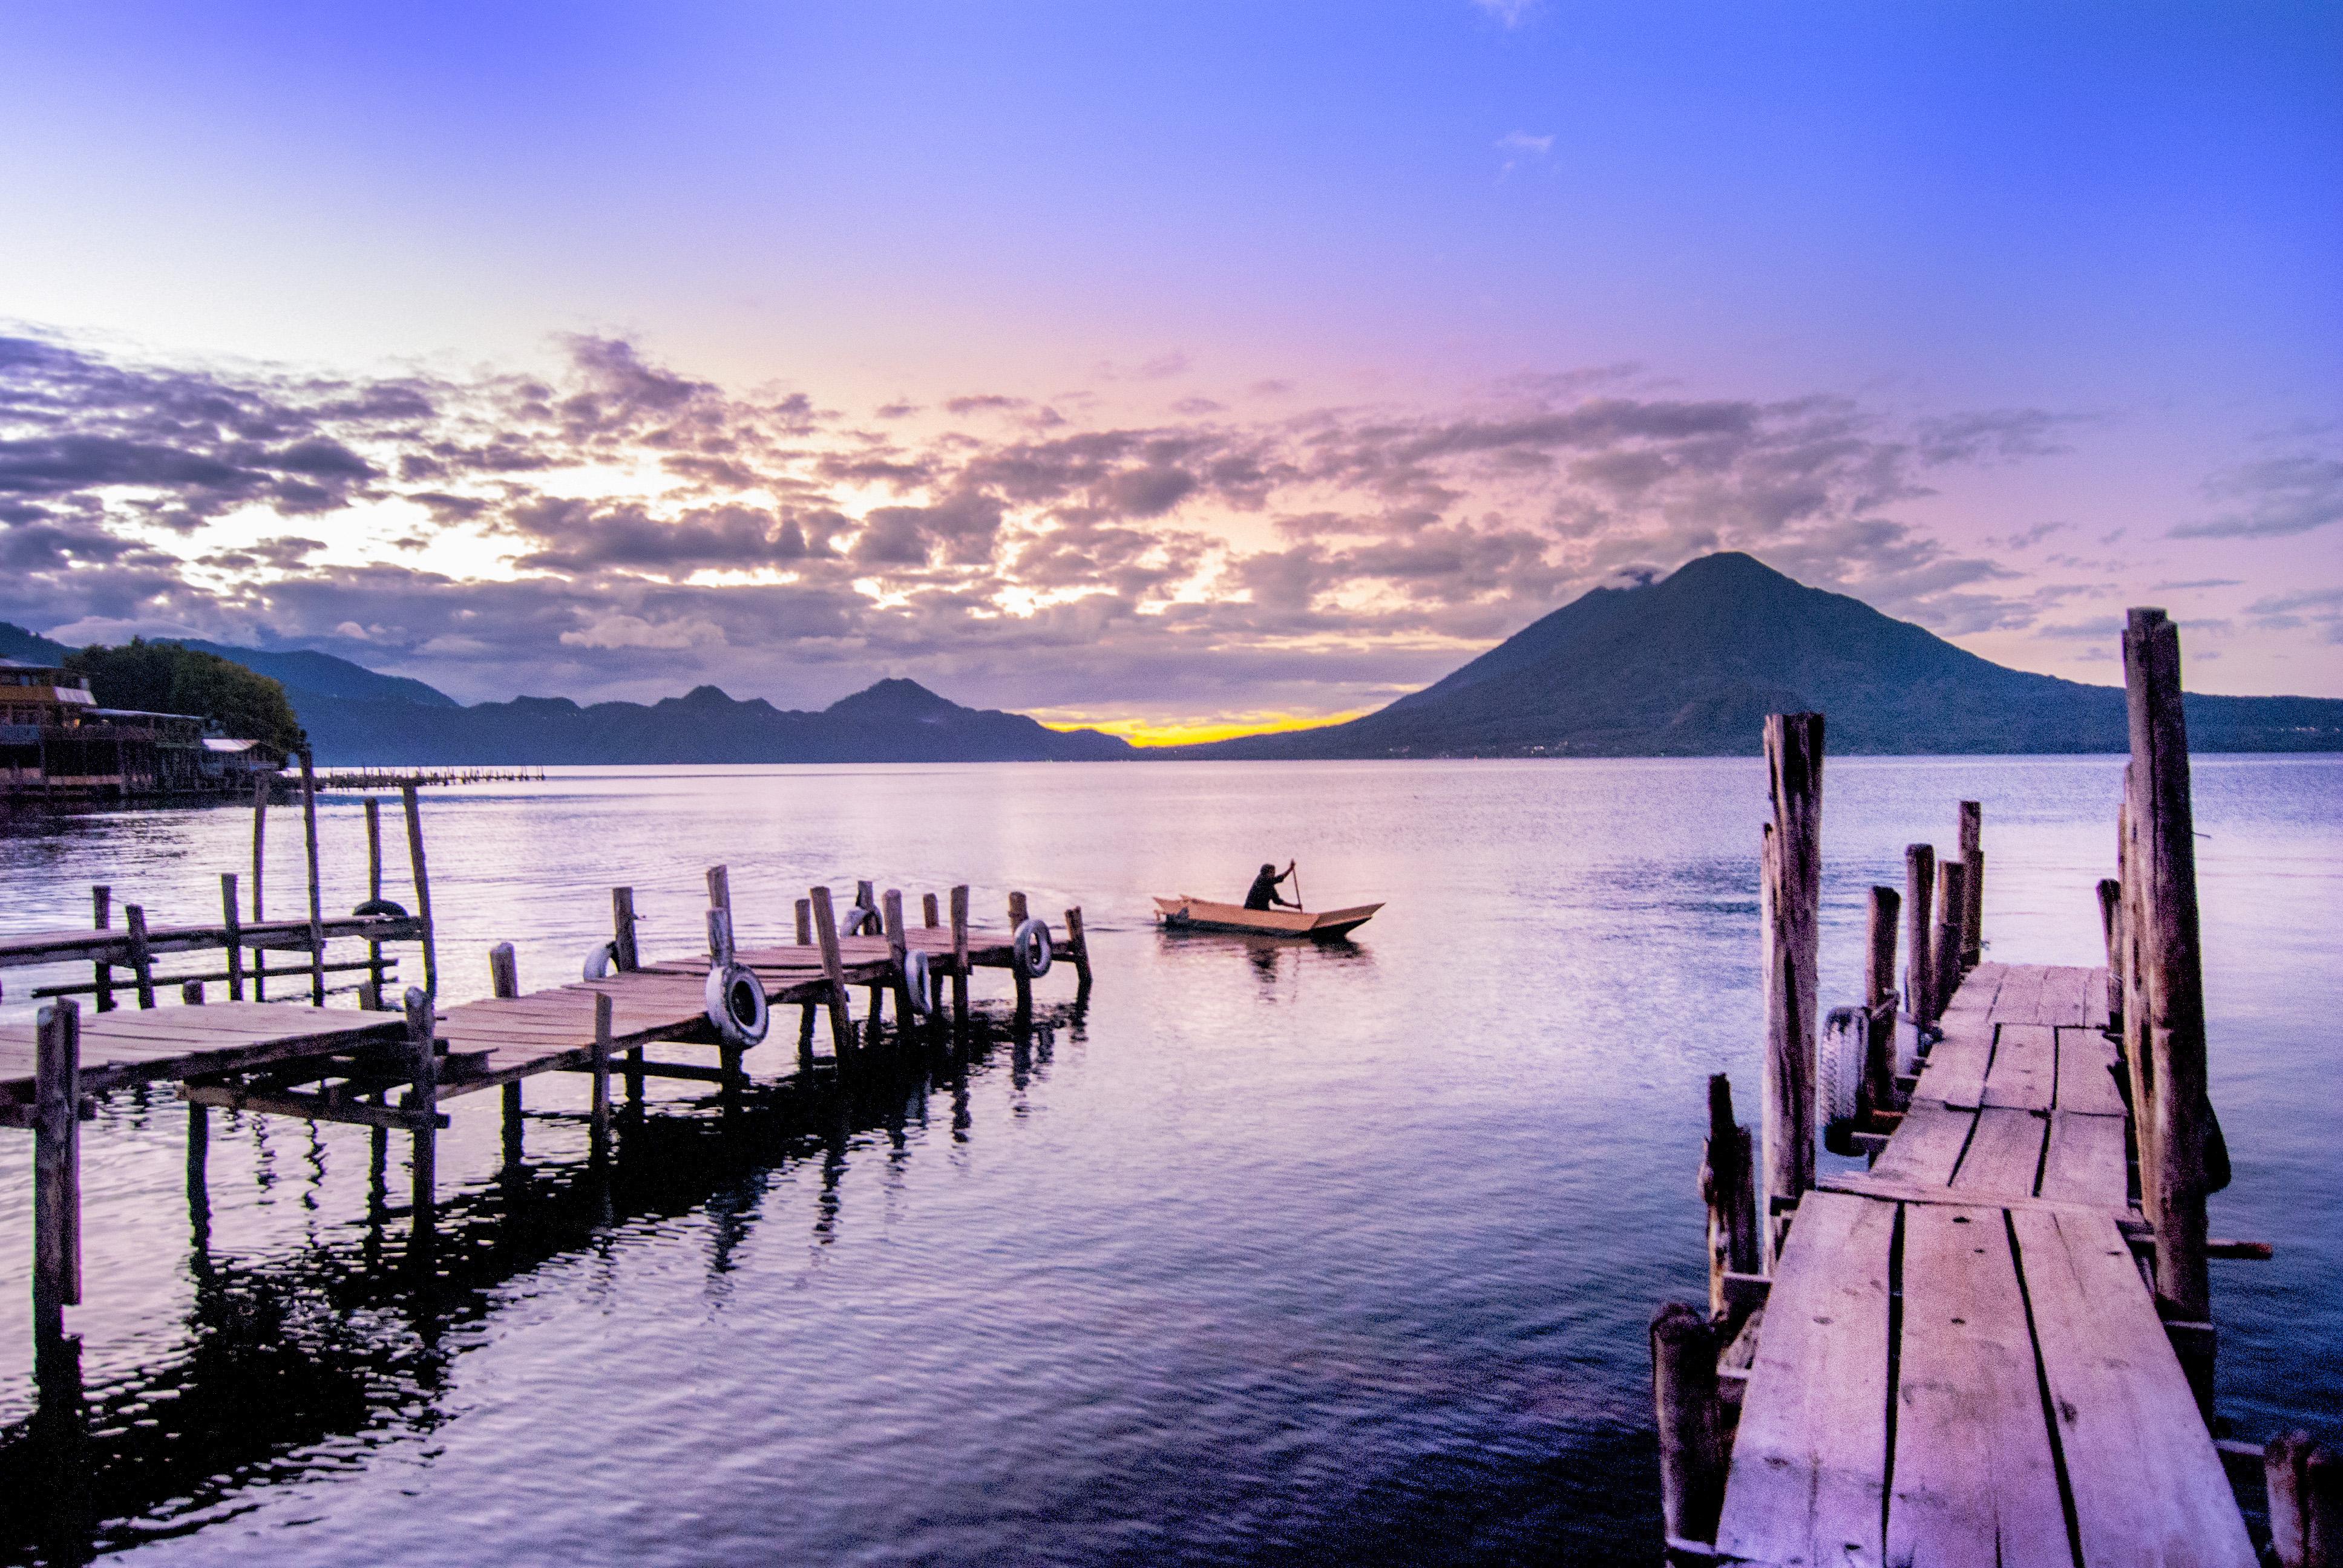 Morning on Lake Atitlán, Guatemala